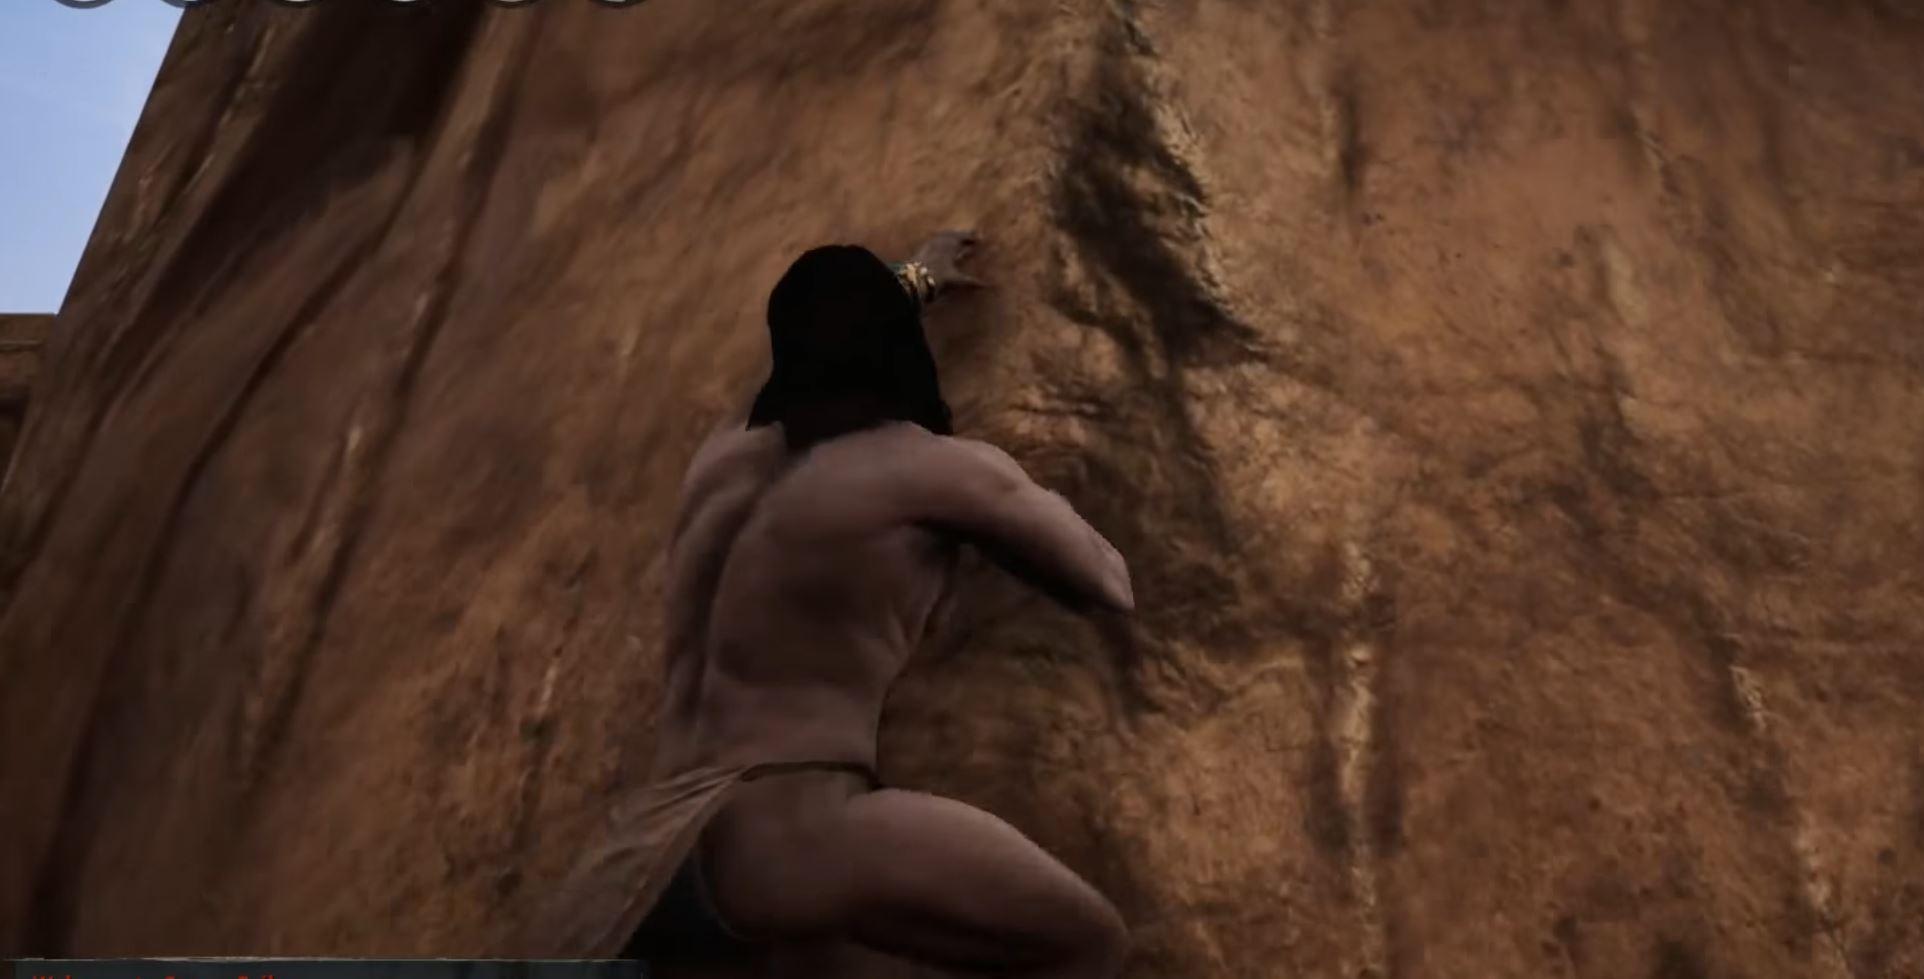 Conan Kletterausrüstung : Conan exiles kletter feature u barbaren entdecken parcours mein